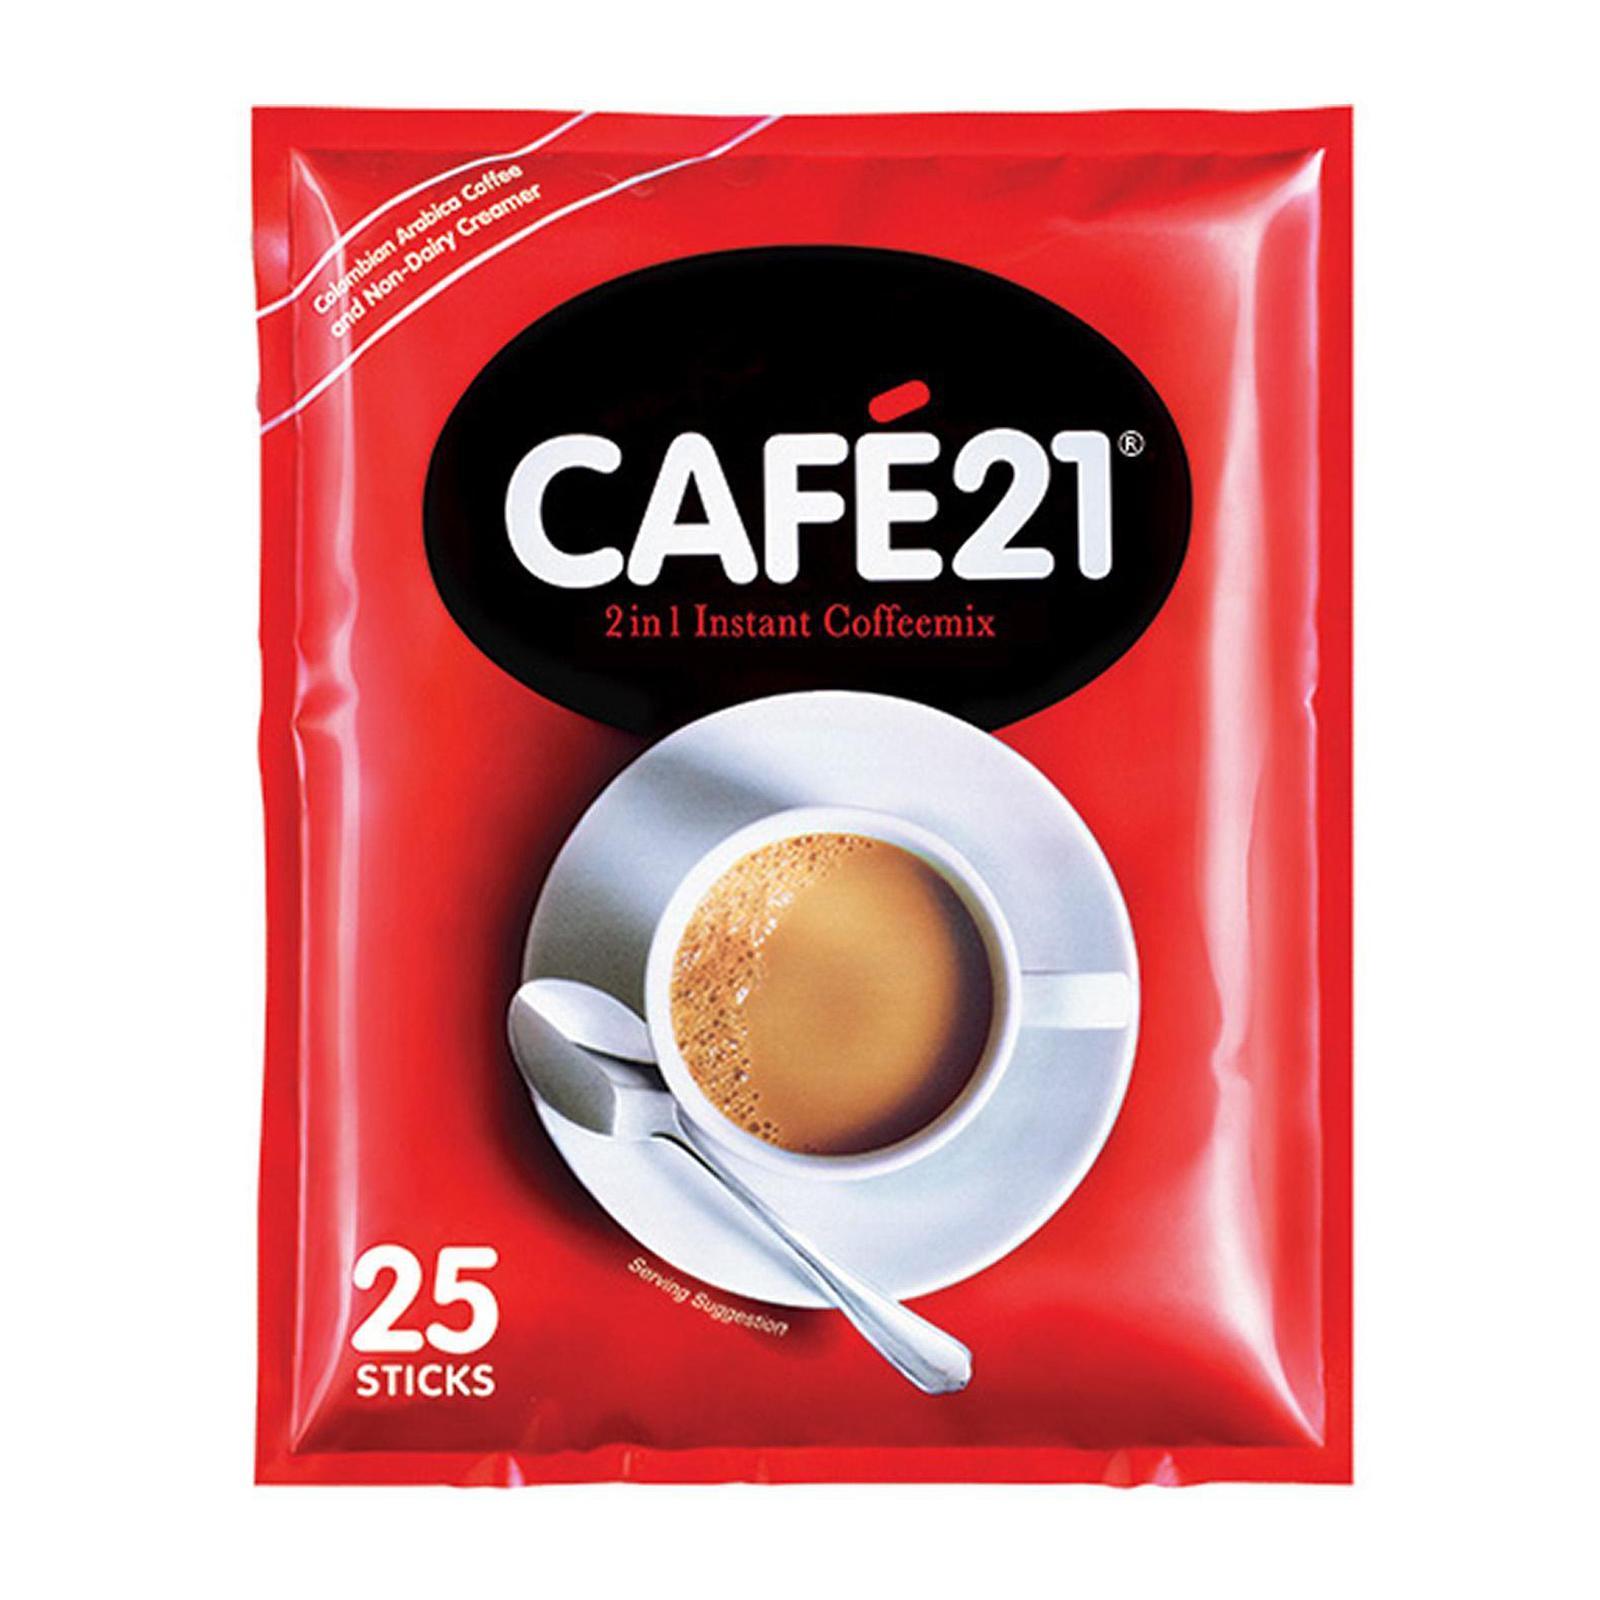 Cafe21 2 in1 Instant Coffeemix